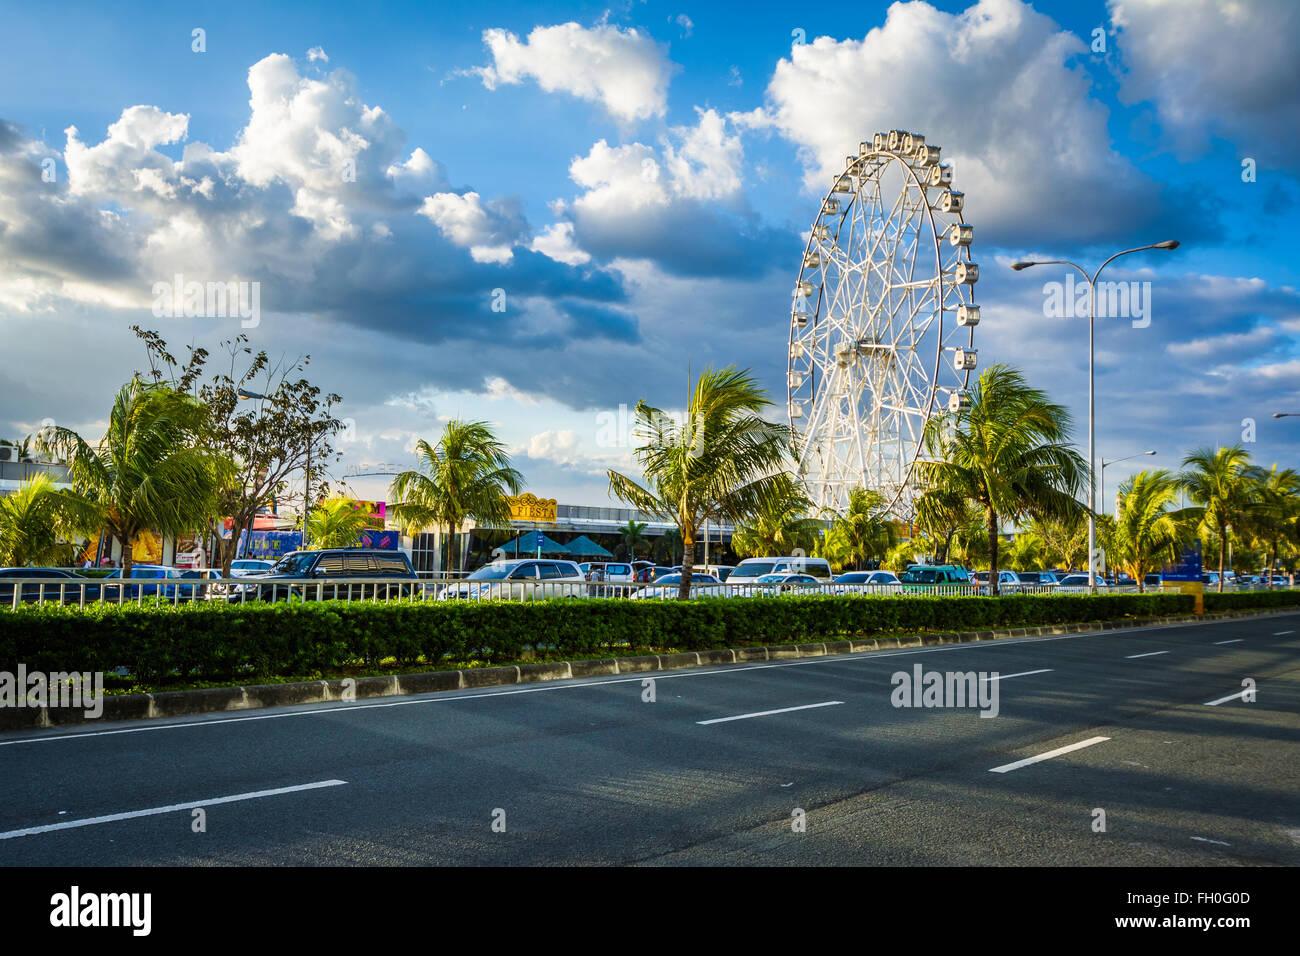 Ferris wheel and Seaside Boulevard, in Pasay, Metro Manila, The Philippines. - Stock Image